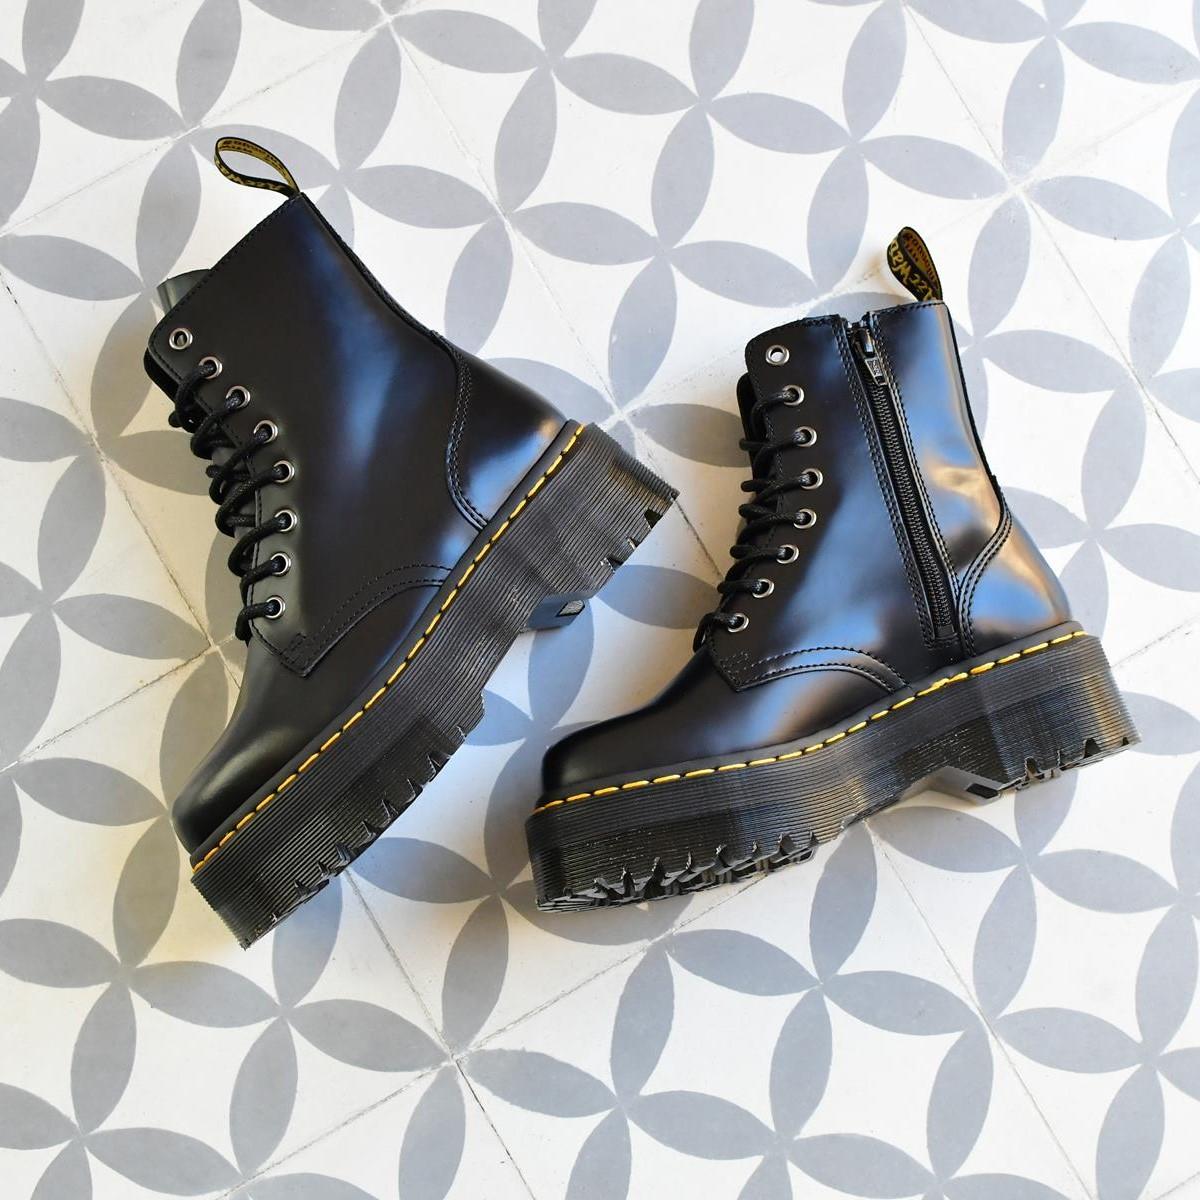 15265001_AmorShoes-bota-plataforma-Dr.Martens-jadon-black-polished-smooth-boots-botas-negro-negra-15265001-13